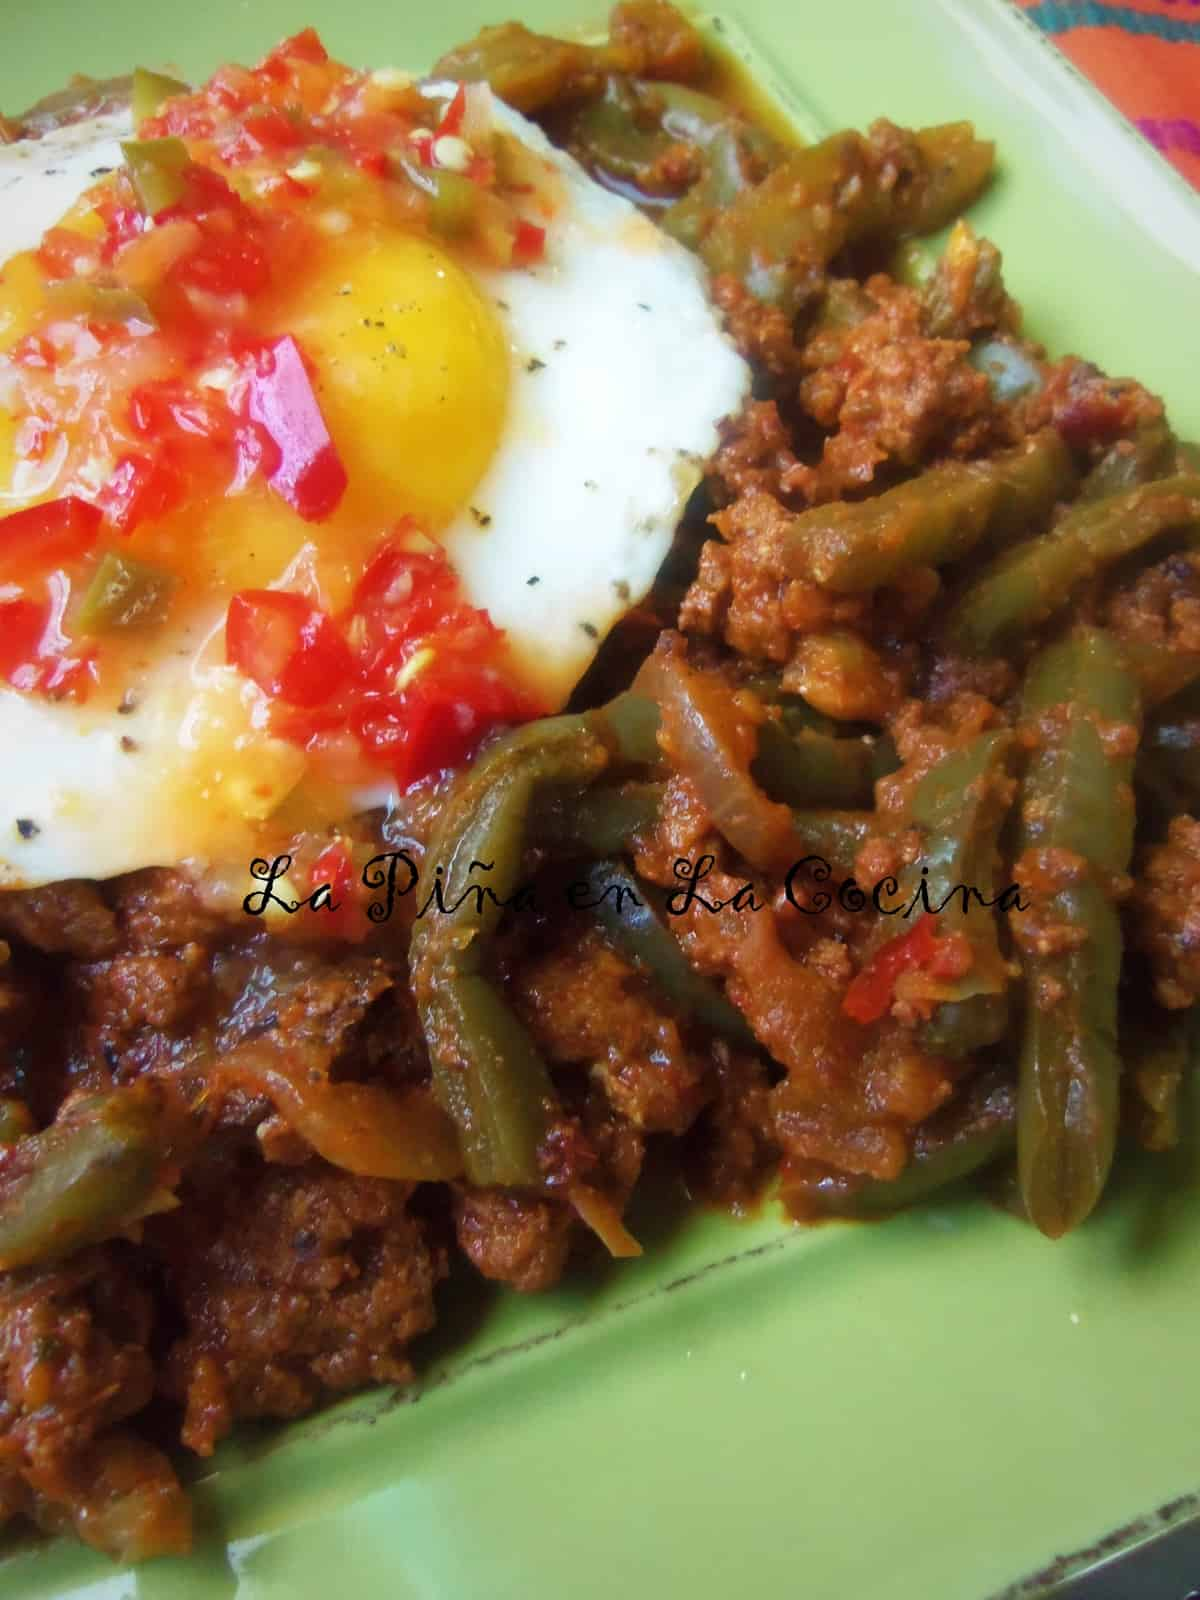 Nopalitos con Chorizo, Sunny Side Up Egg with Habanero Fresno Hot Sauce